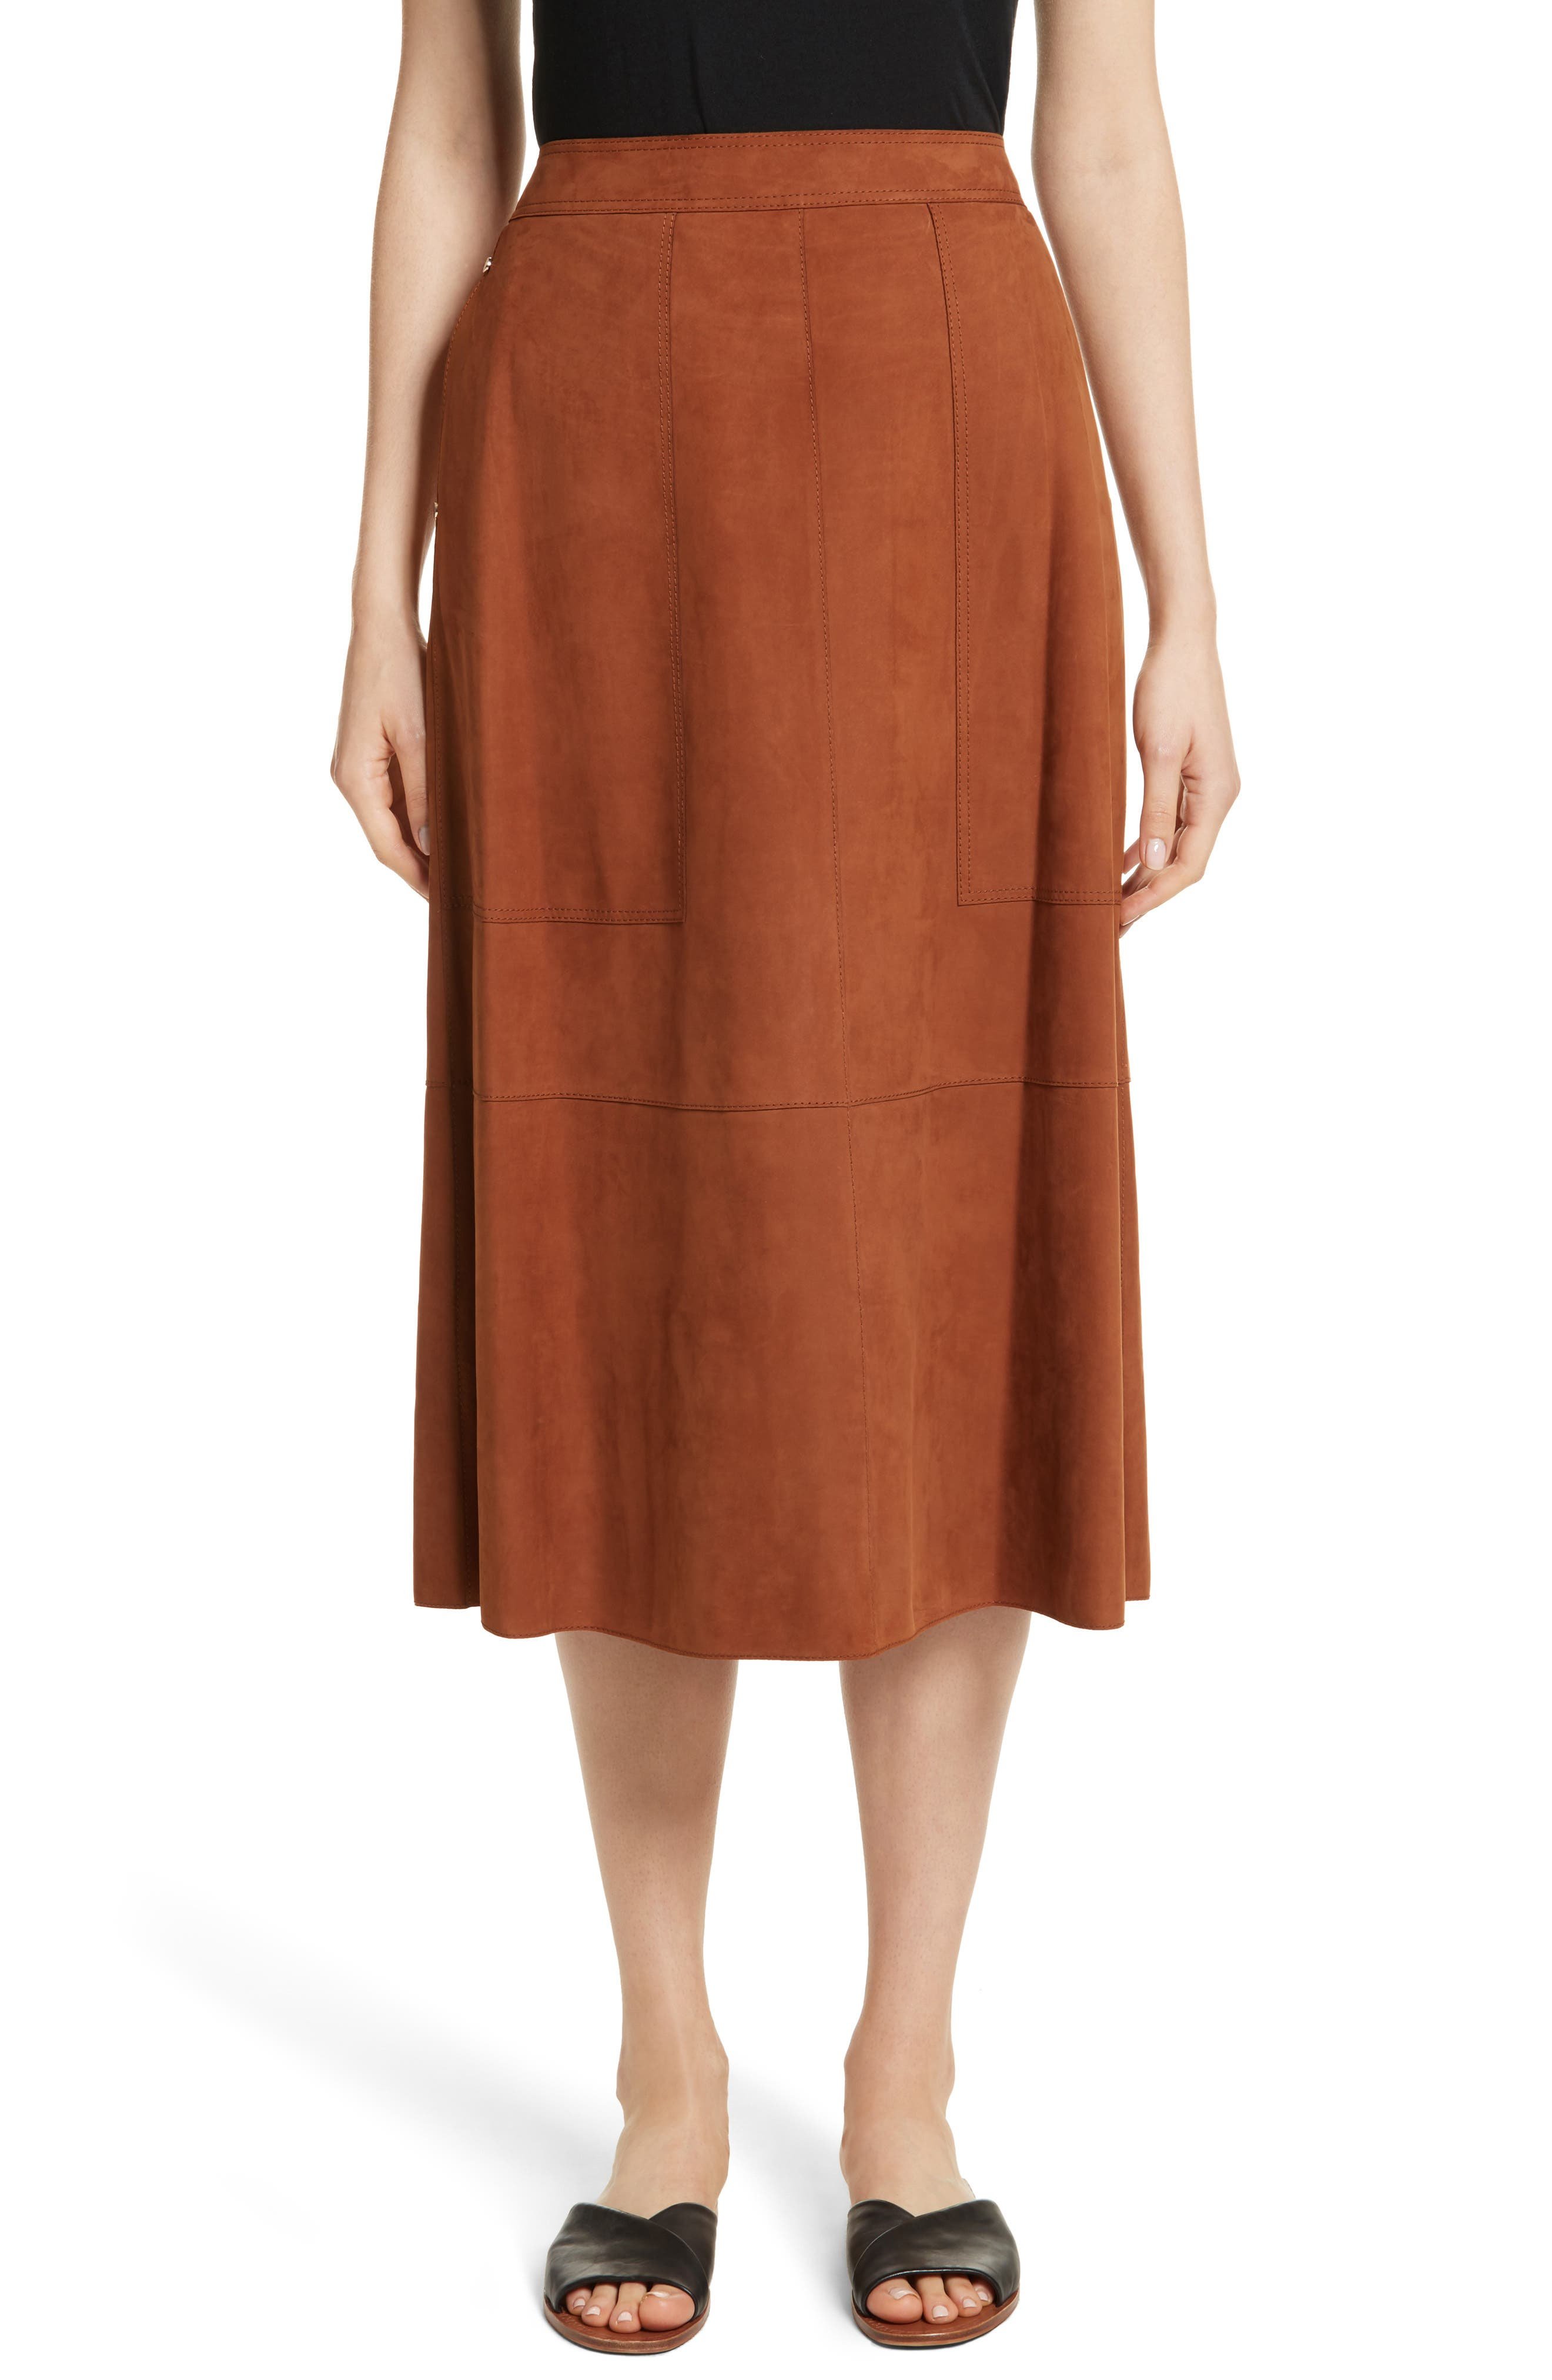 Alternate Image 1 Selected - Lafayette 148 New York Rosella Leather Skirt